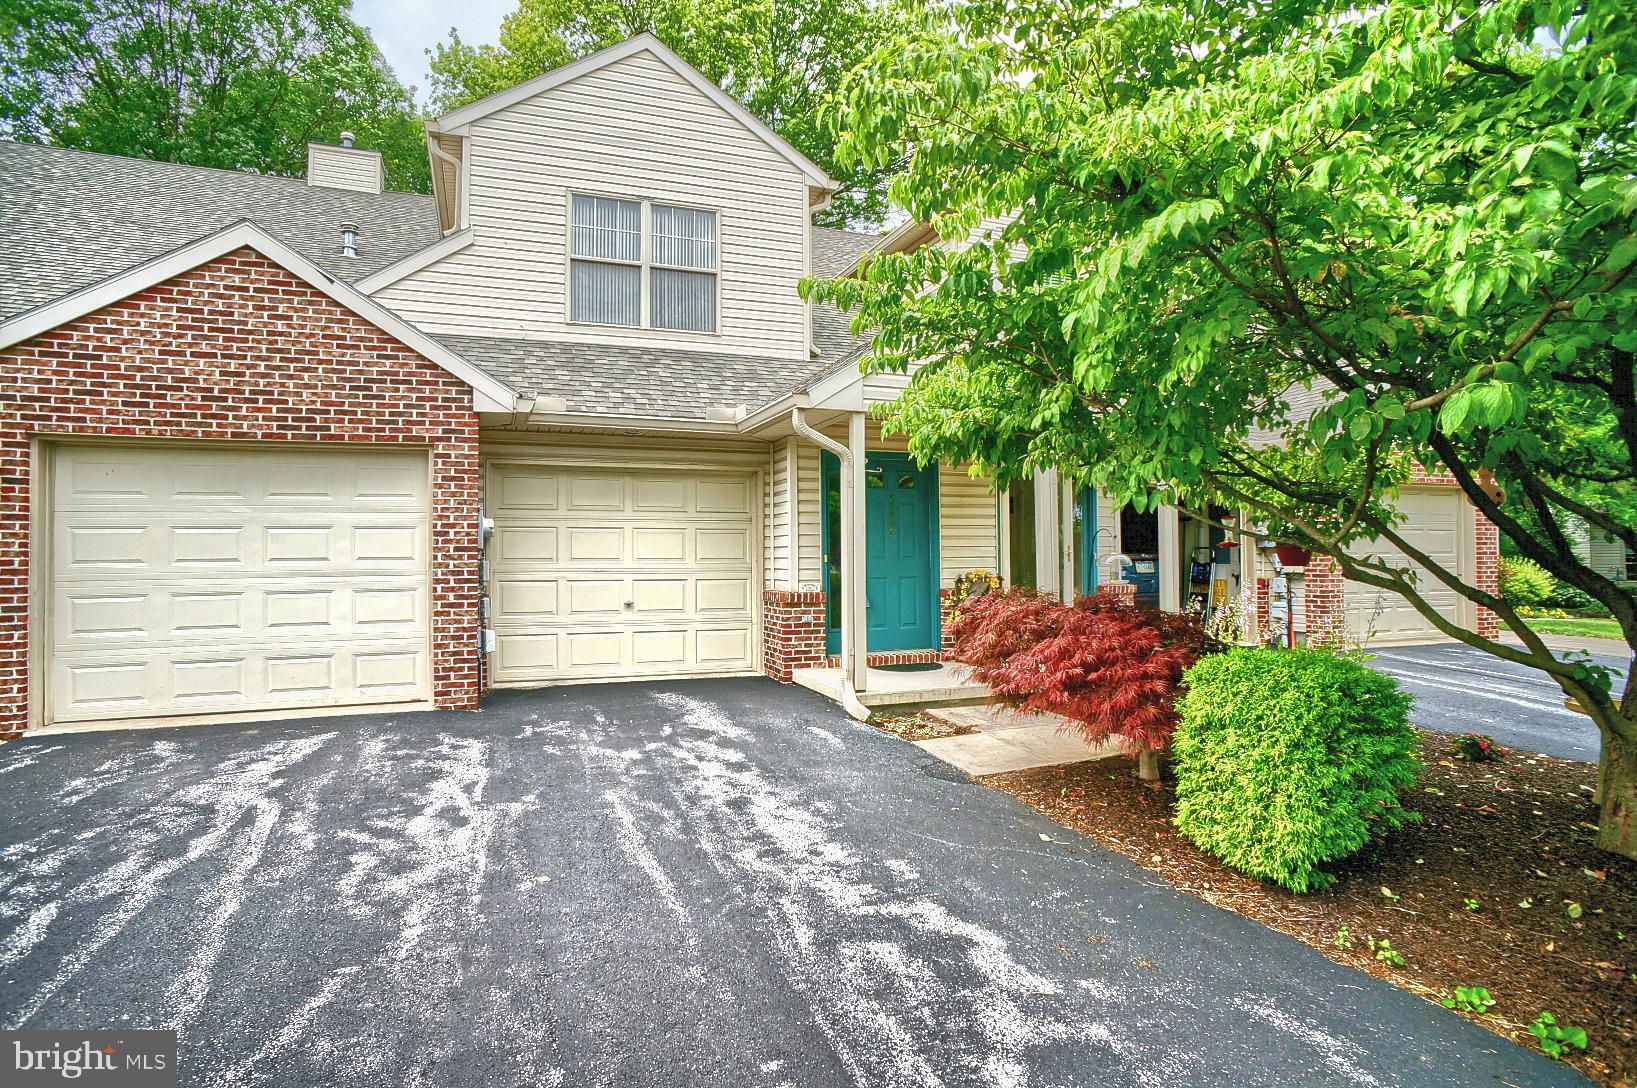 5228 Cobblestone Drive, Mechanicsburg, PA 17055 now has a new price of $164,900!